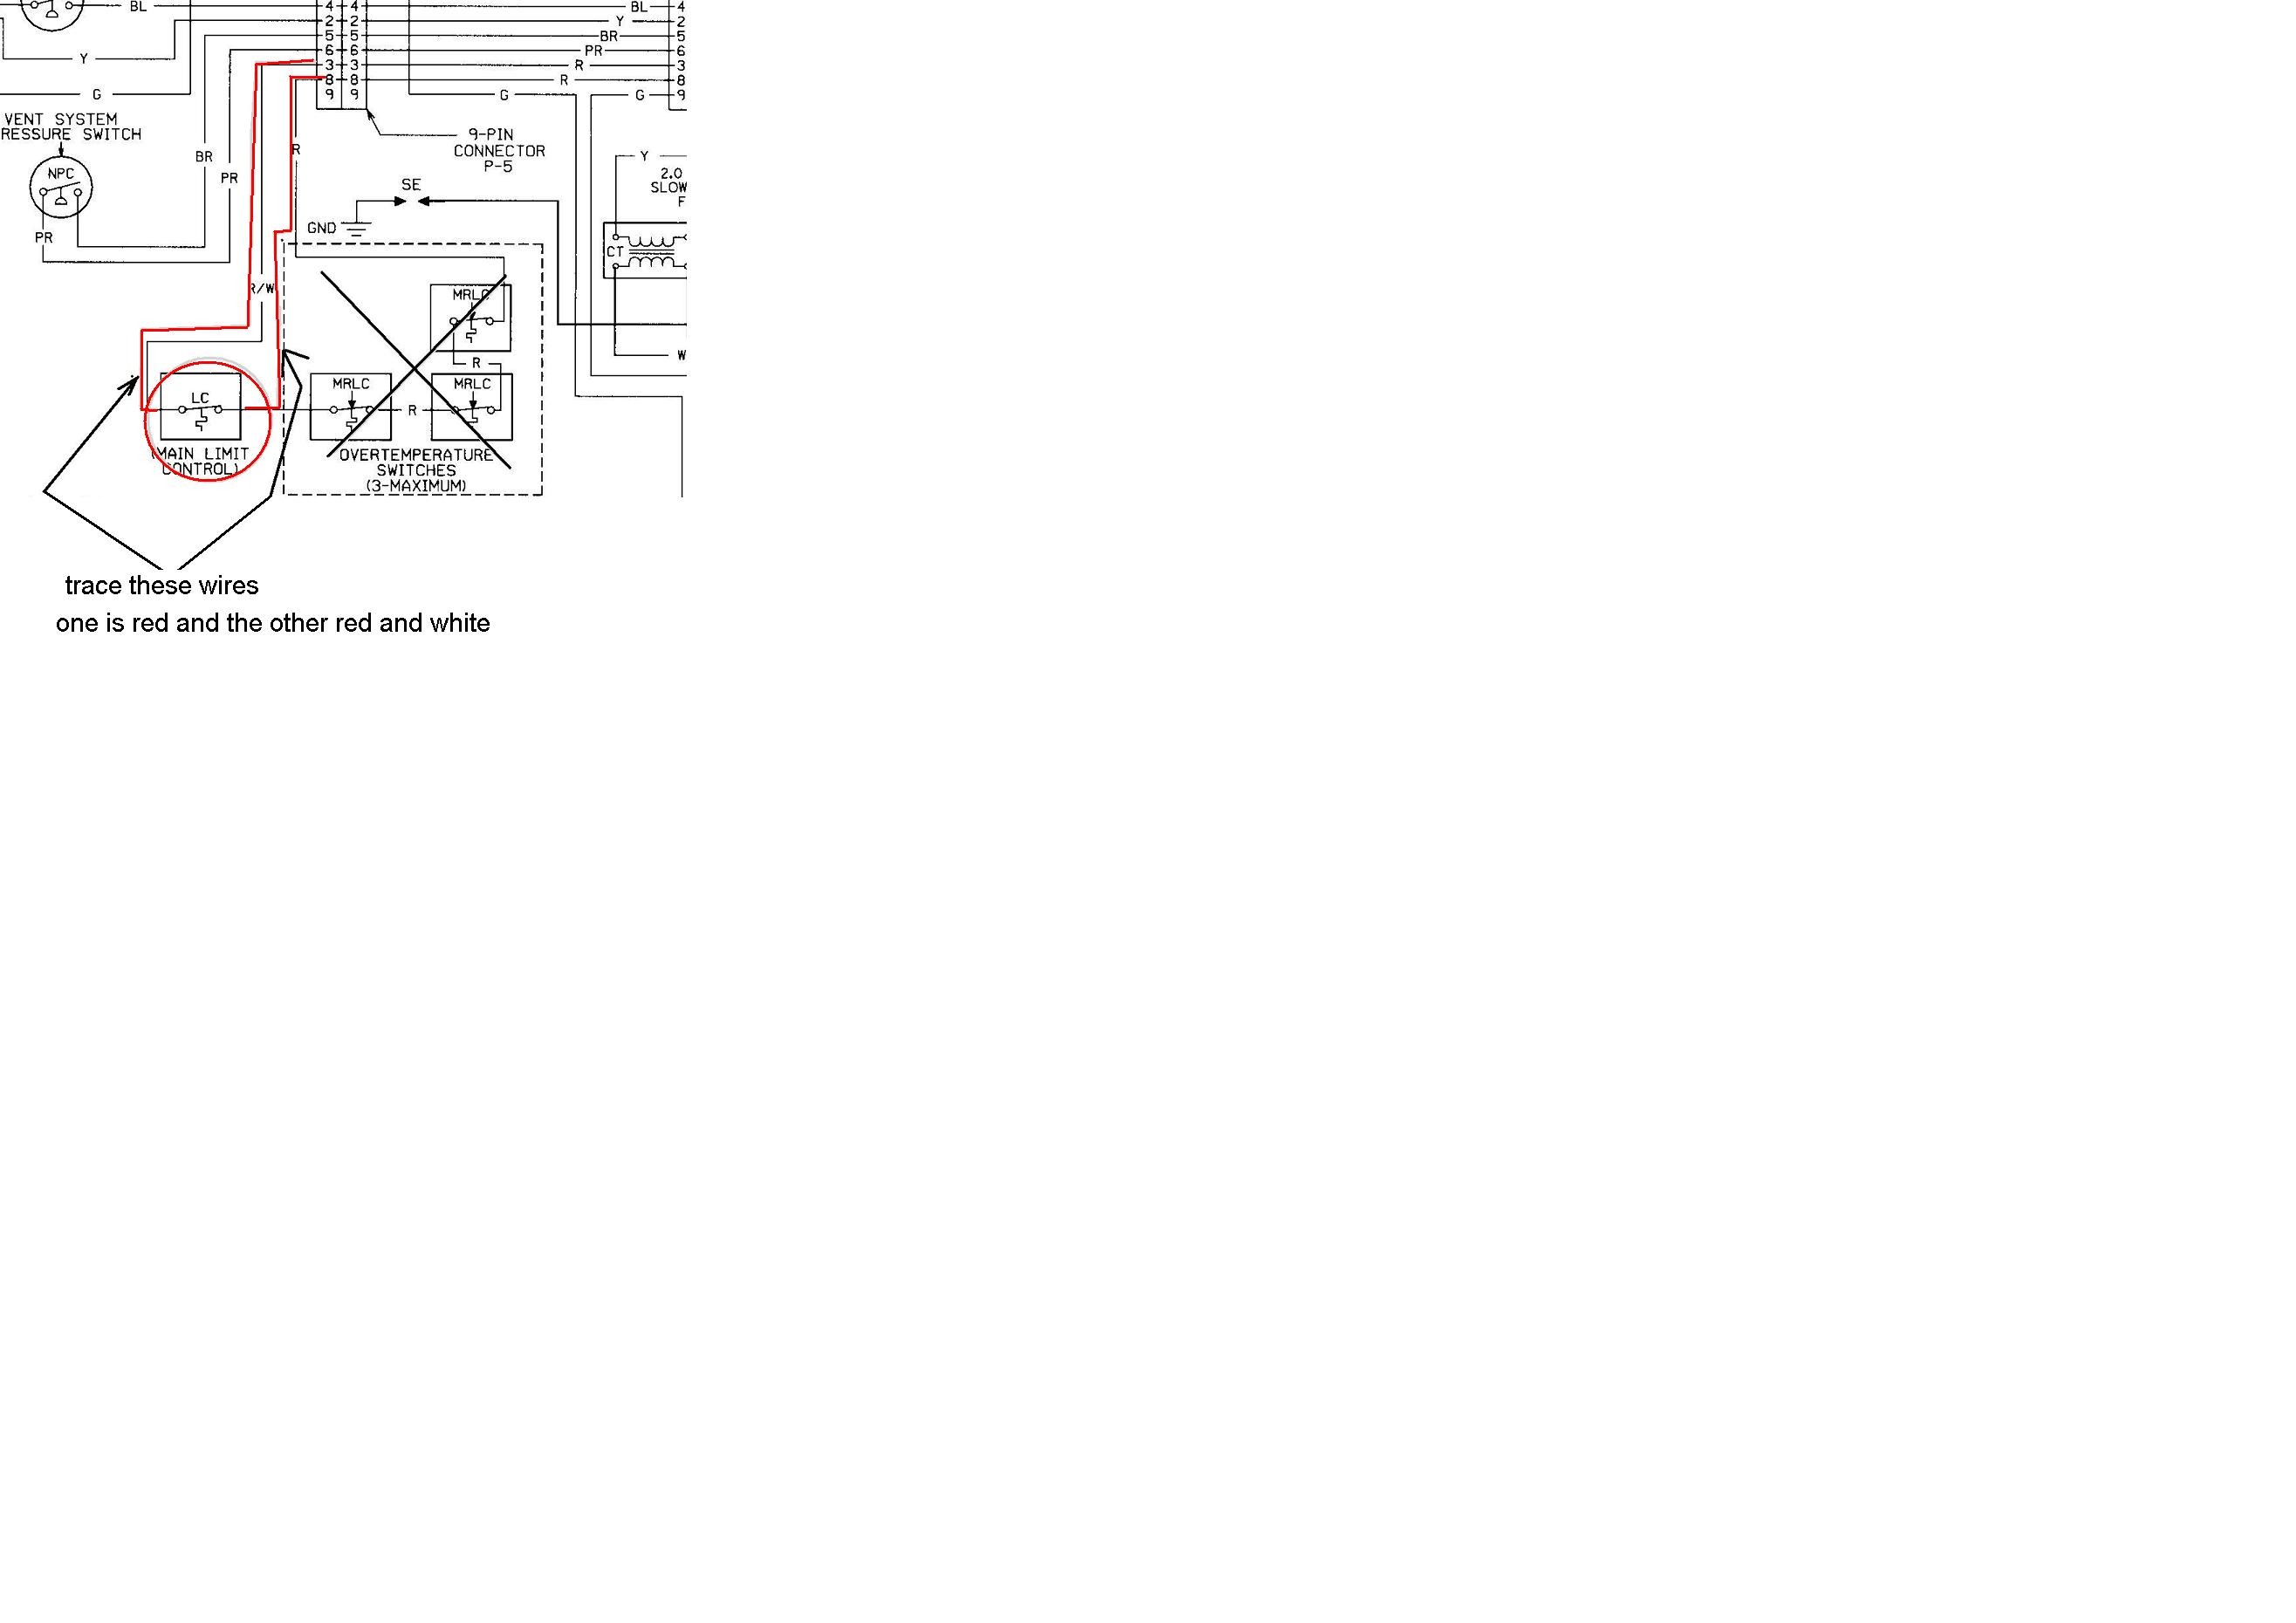 Crownline Boat Fuse Box : Crownline wiring diagram malibu